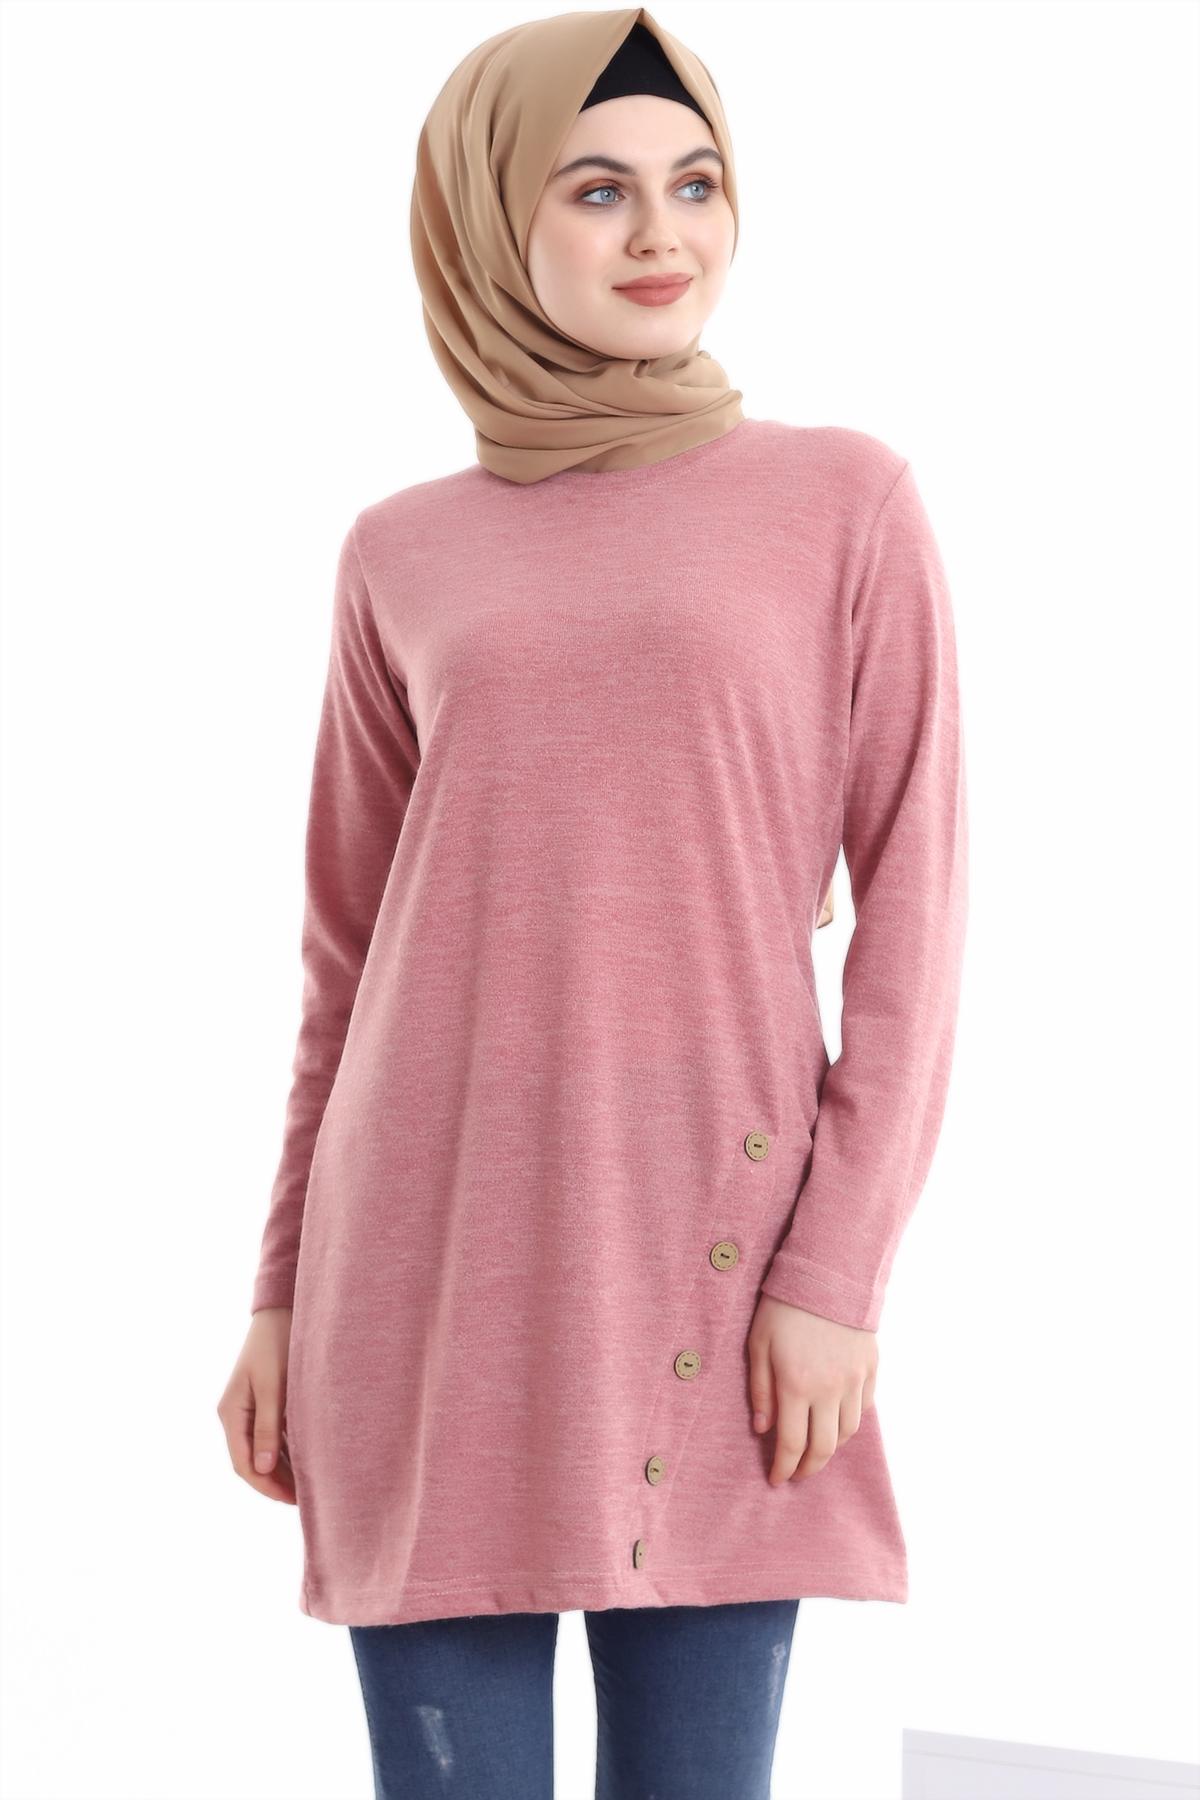 2021 season Autumn winter Dress Women O Neck long Sleeve Casual Sweater Dresses Muslim Fashion Buttoned Blouse Elegant Sweater